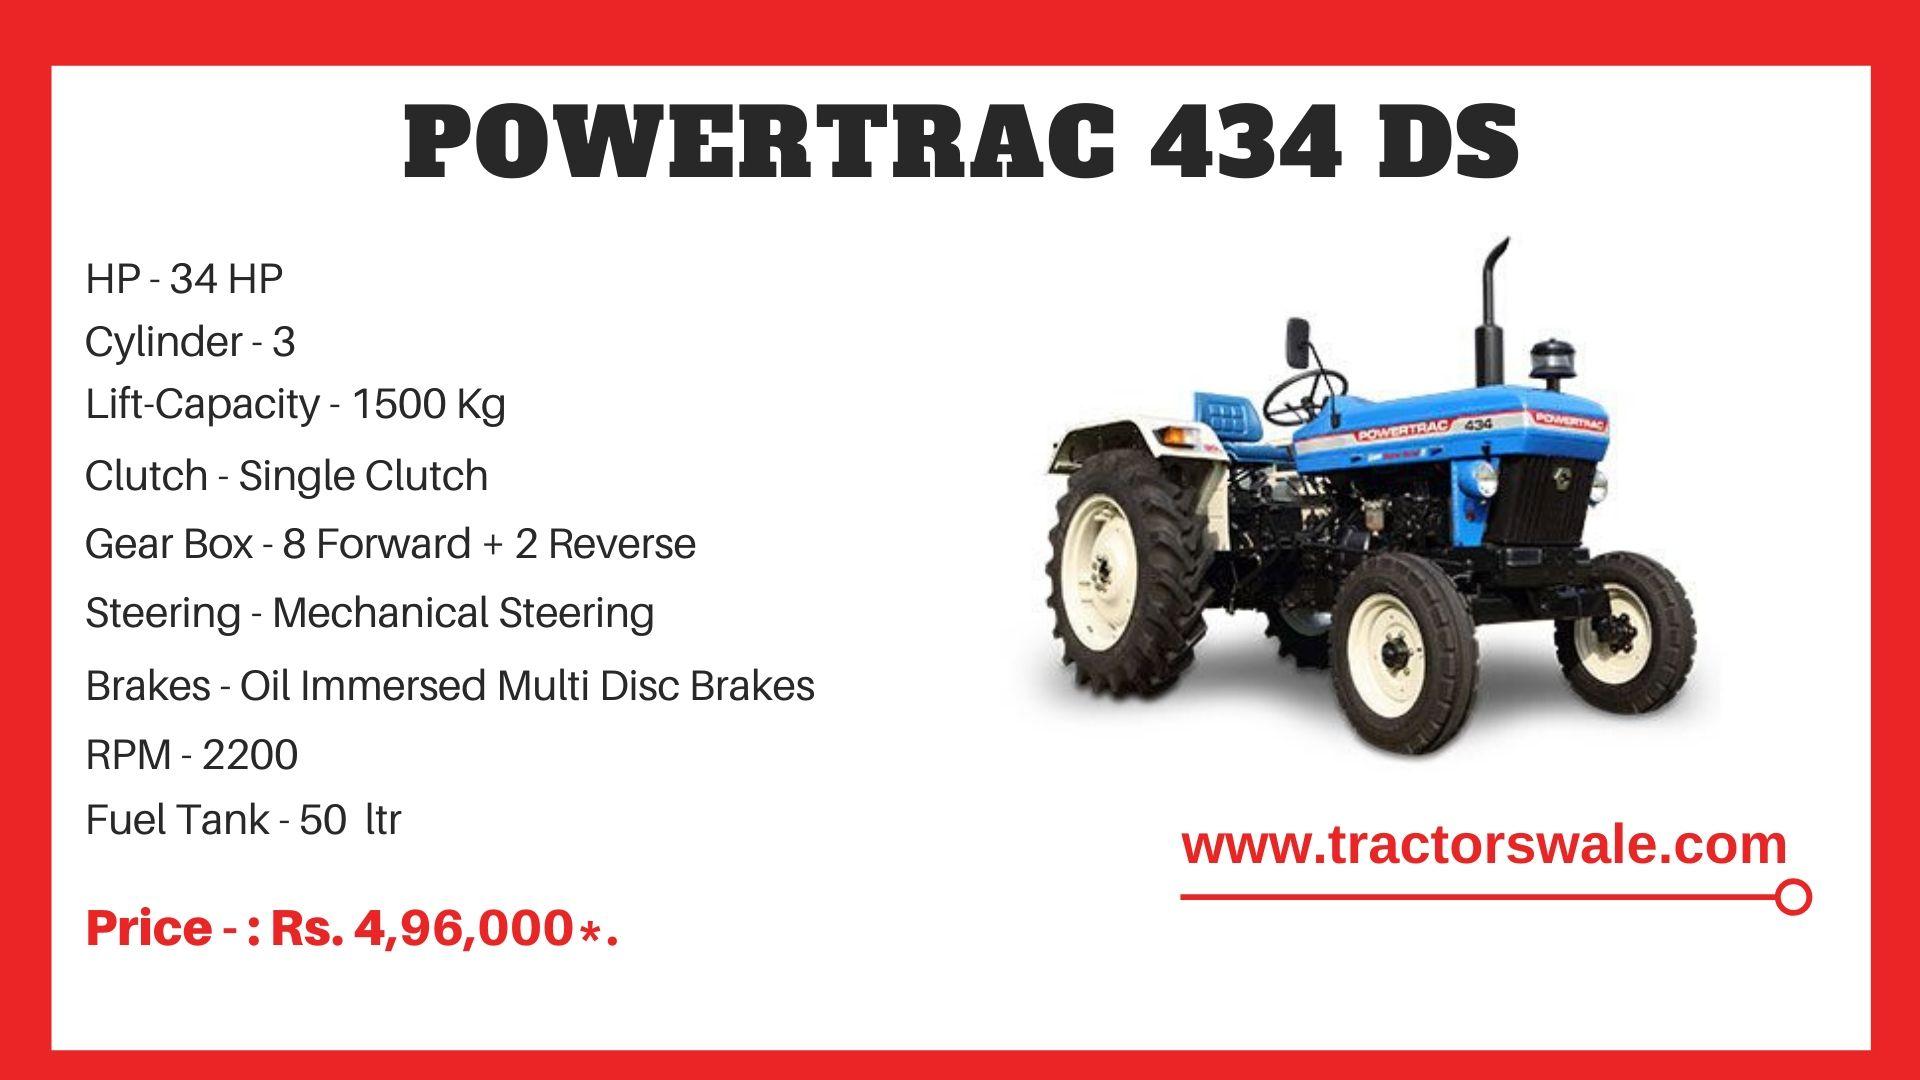 PowerTrac 434 DS tractor